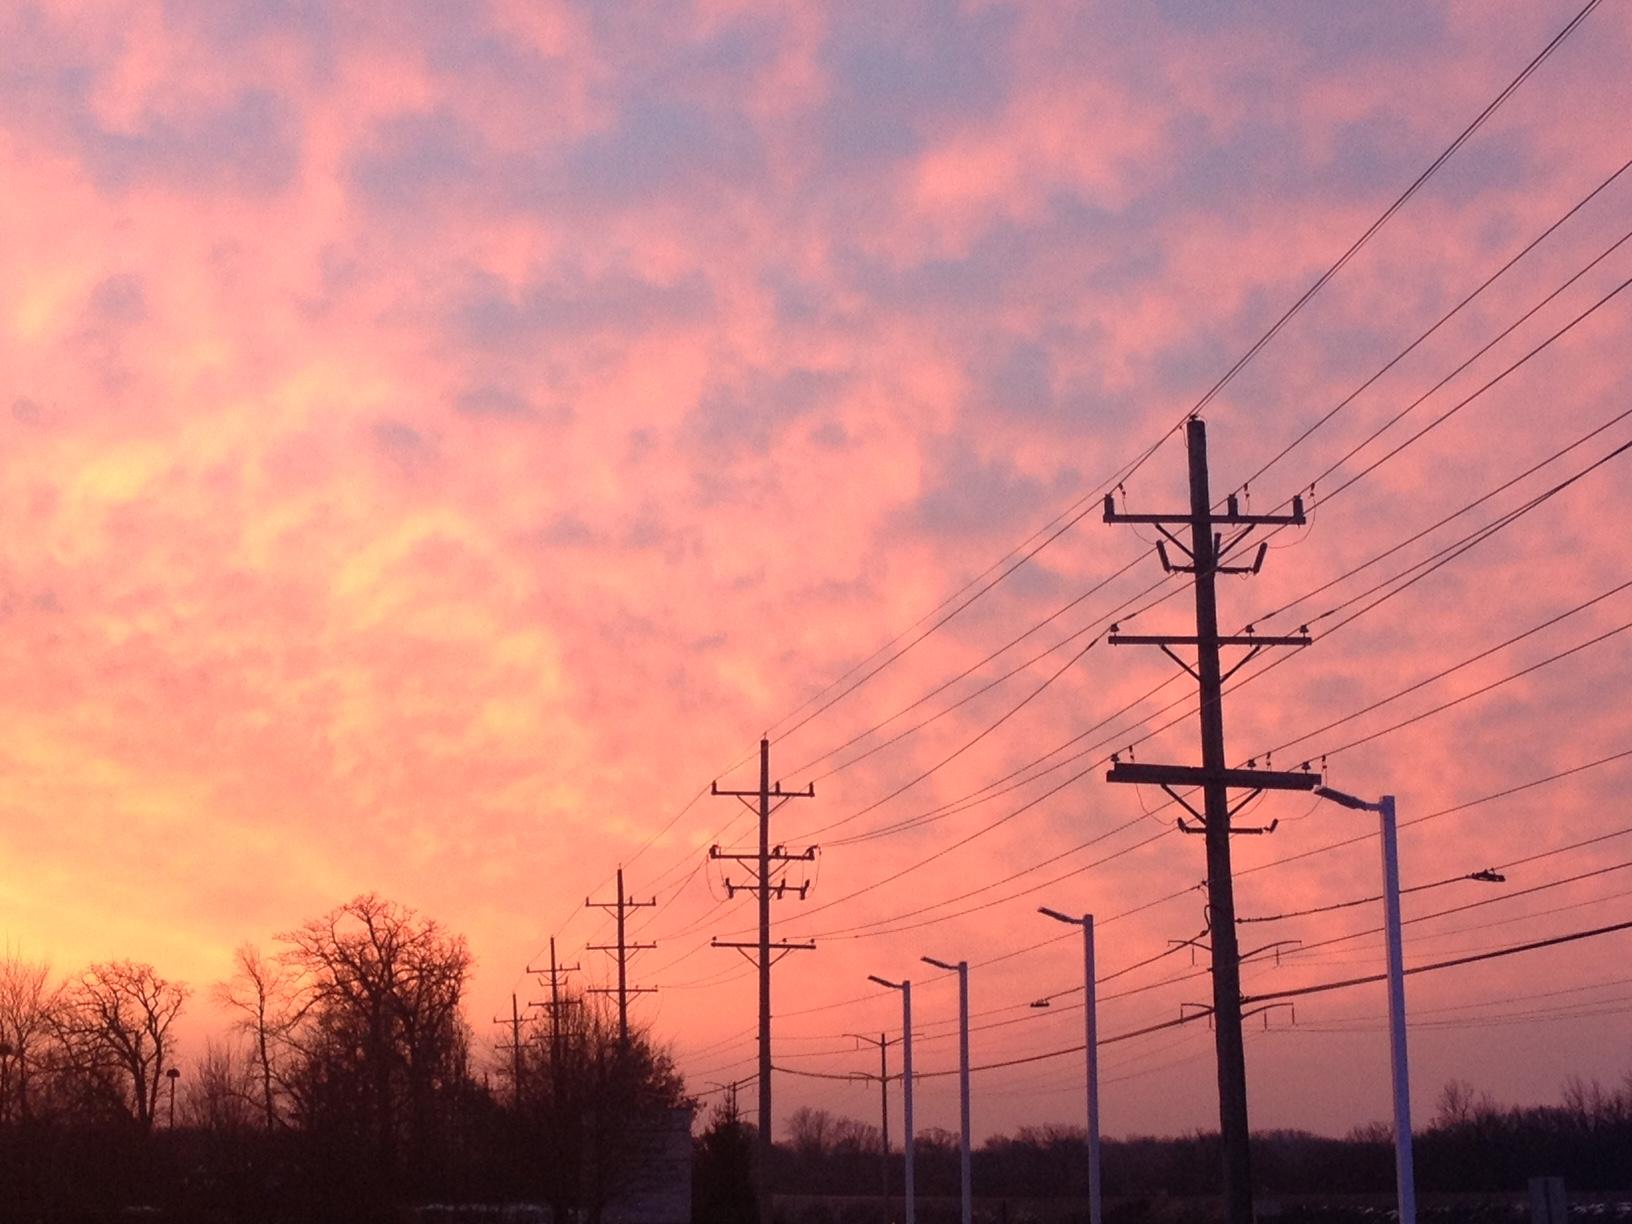 Magical Morning Sky